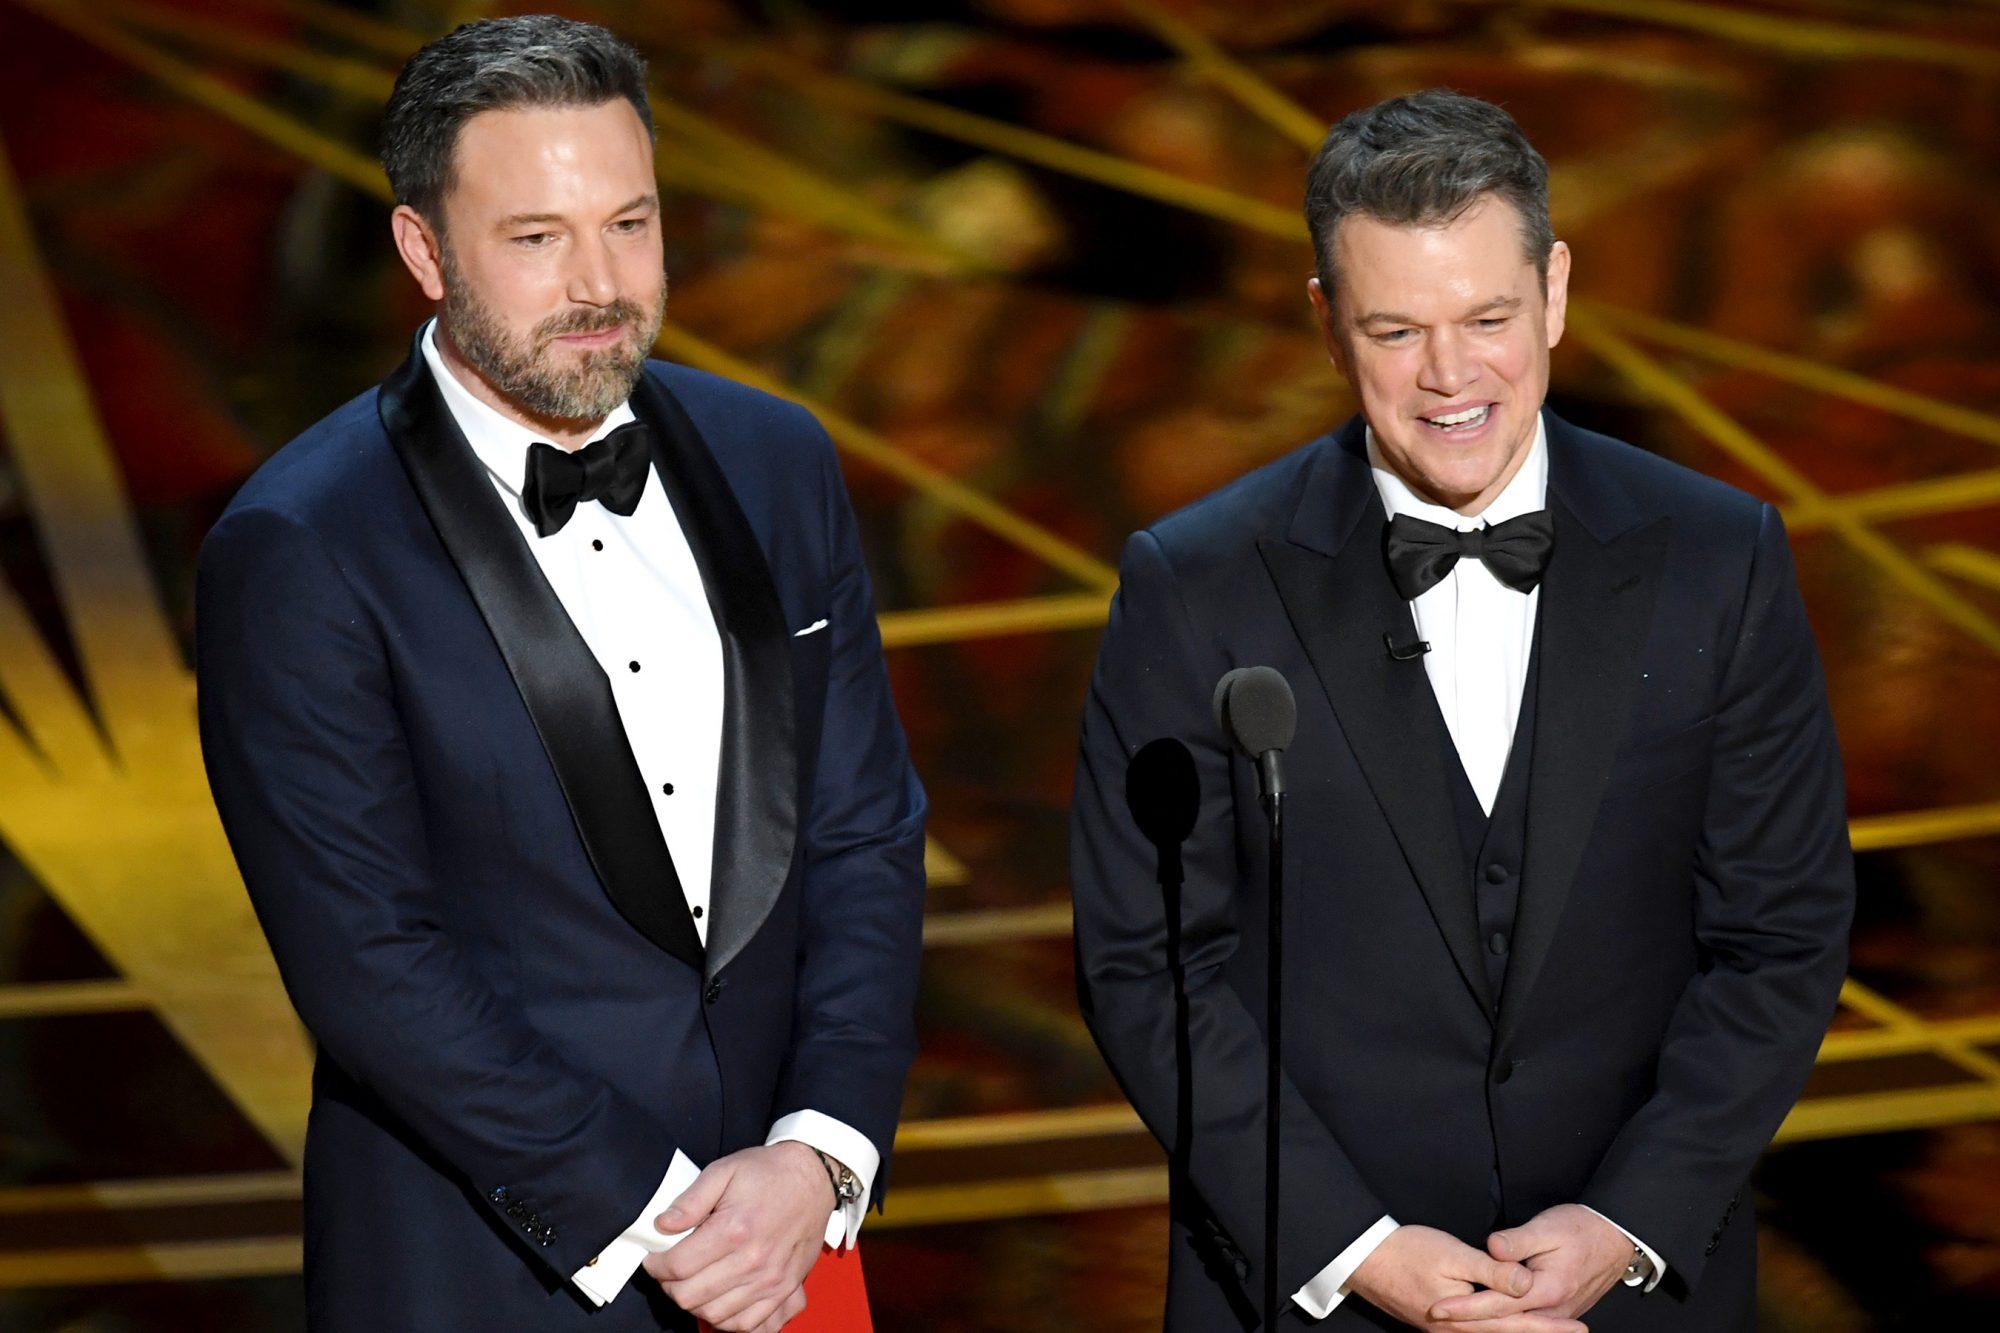 Ben Affleck and Matt Damon at Oscars 2017